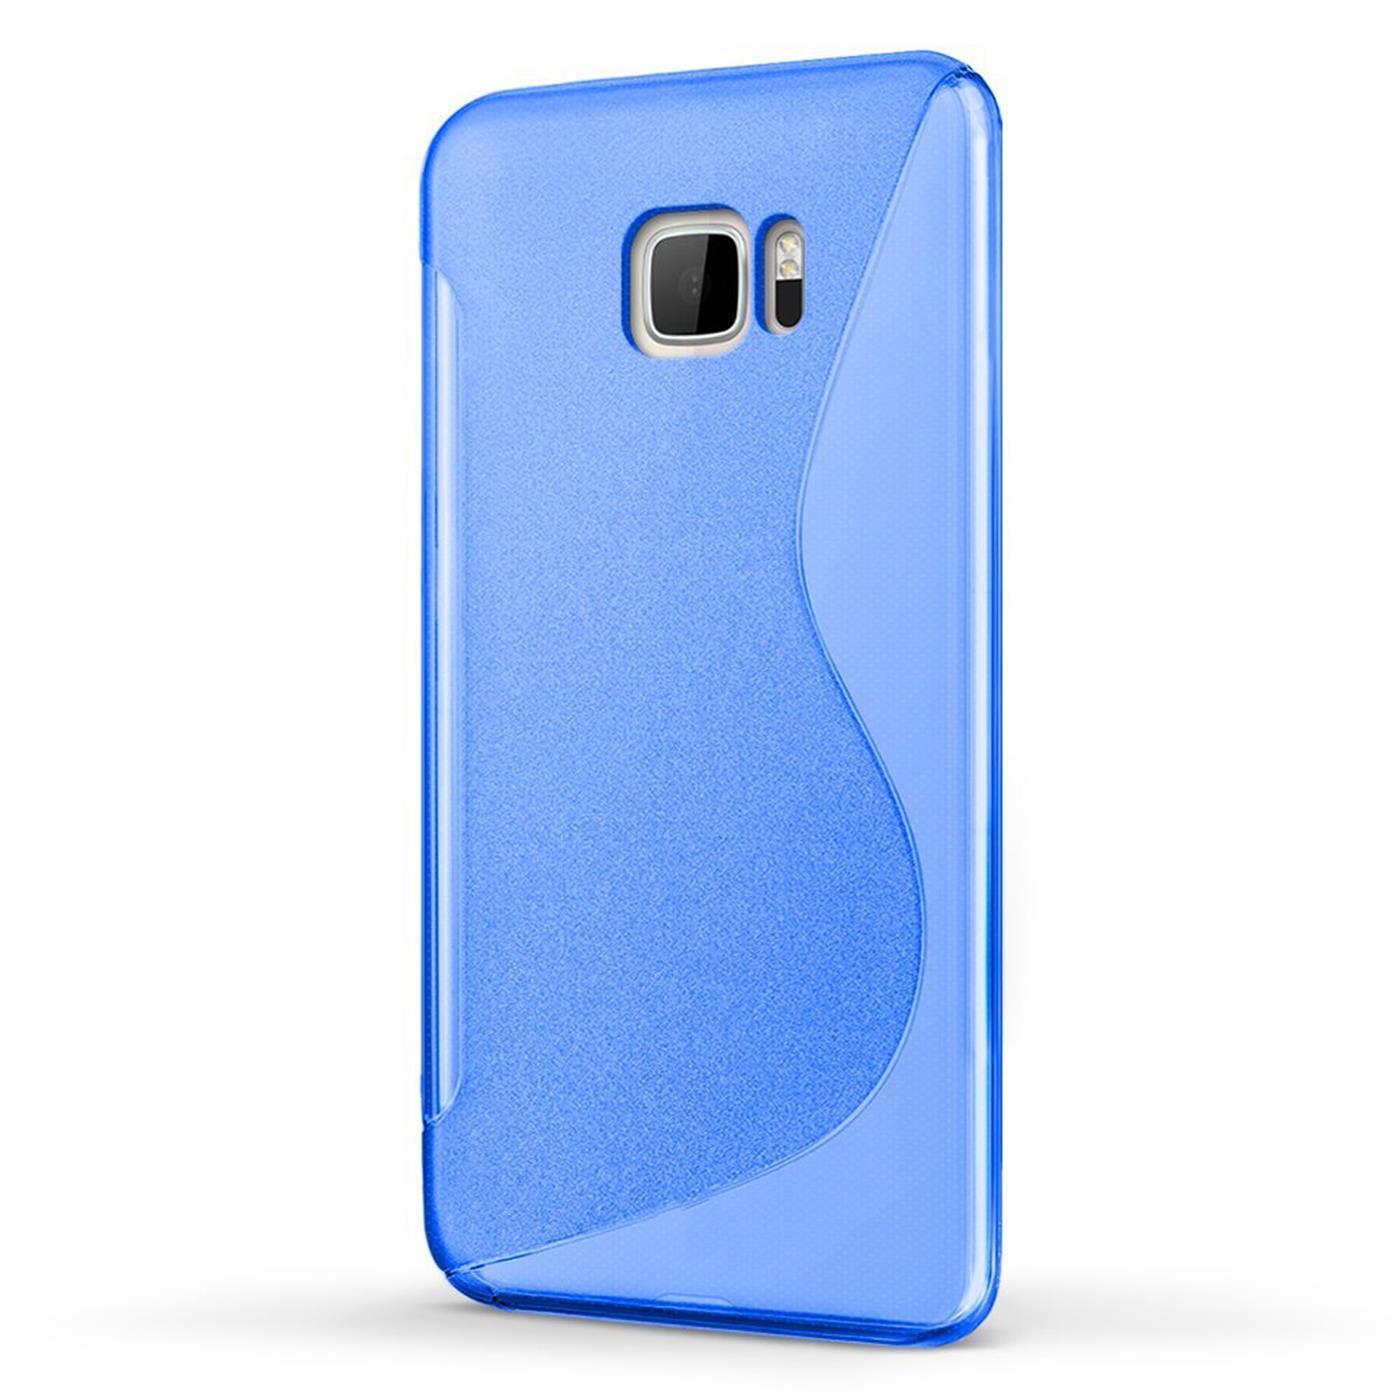 HTC-One-m9-Silikon-Gel-S-Line-Case-Cover-Ultra-Thin-Slim-Back-Bumper Indexbild 8